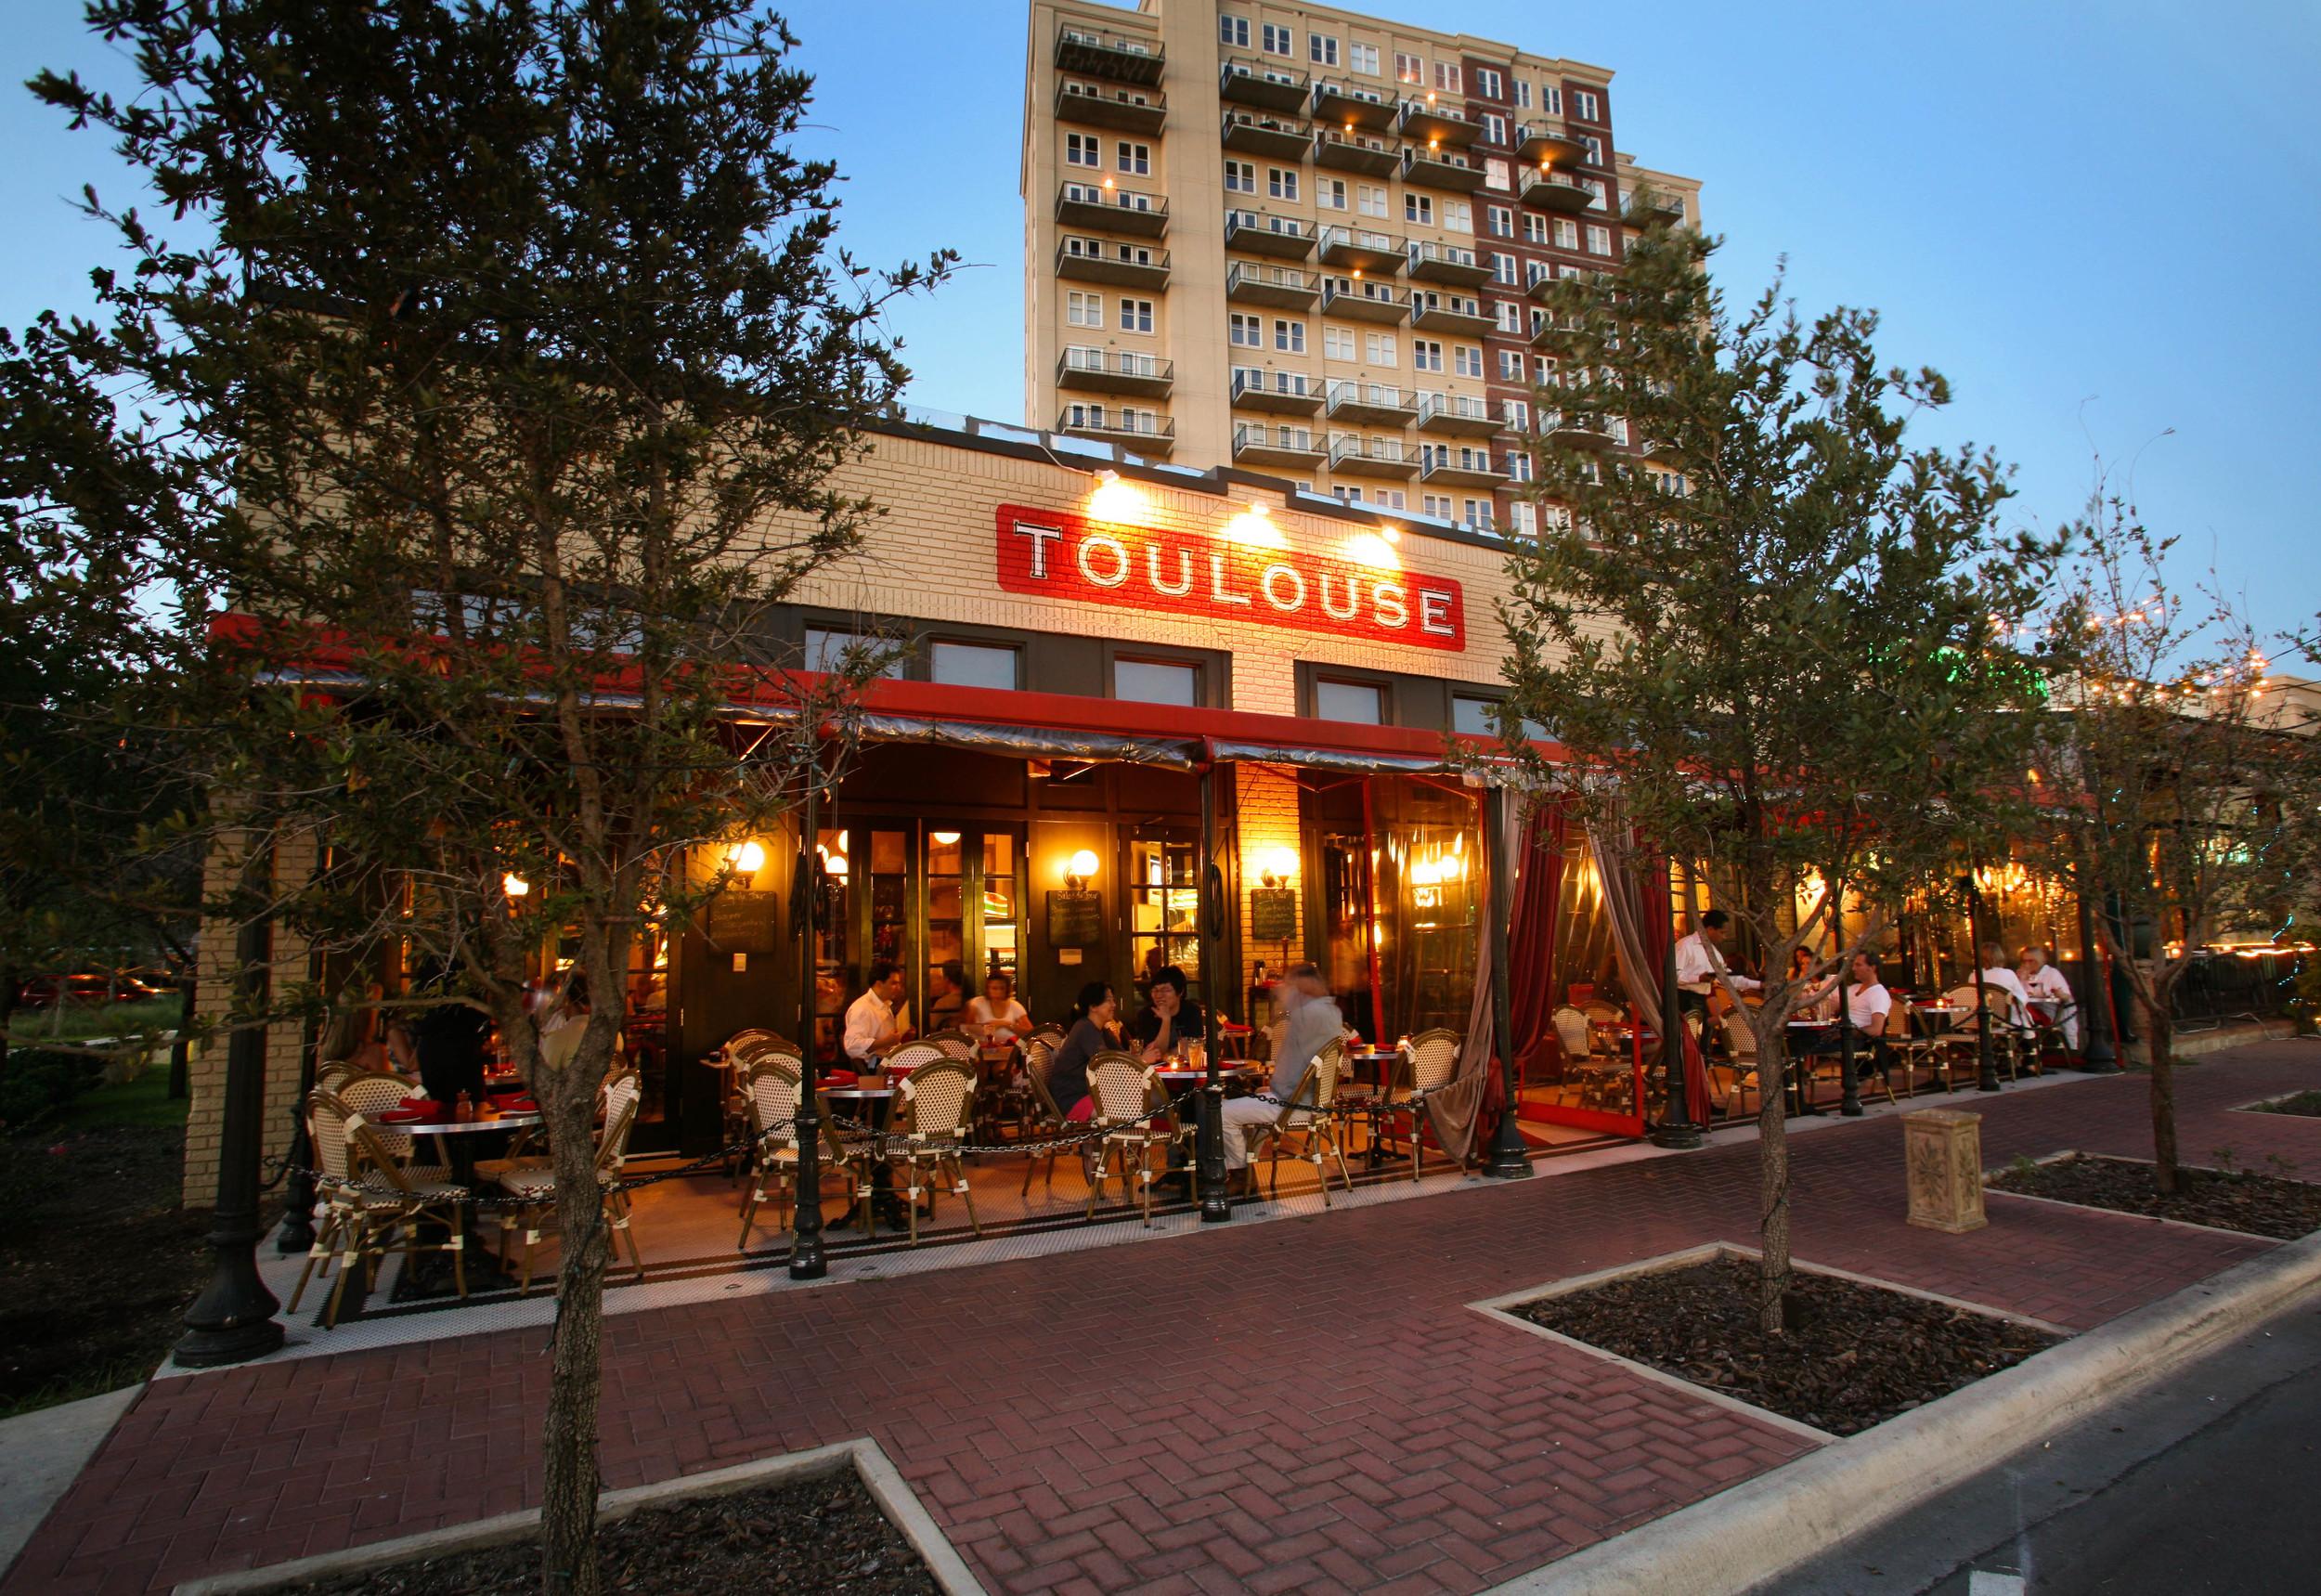 Toulouse_2.jpg